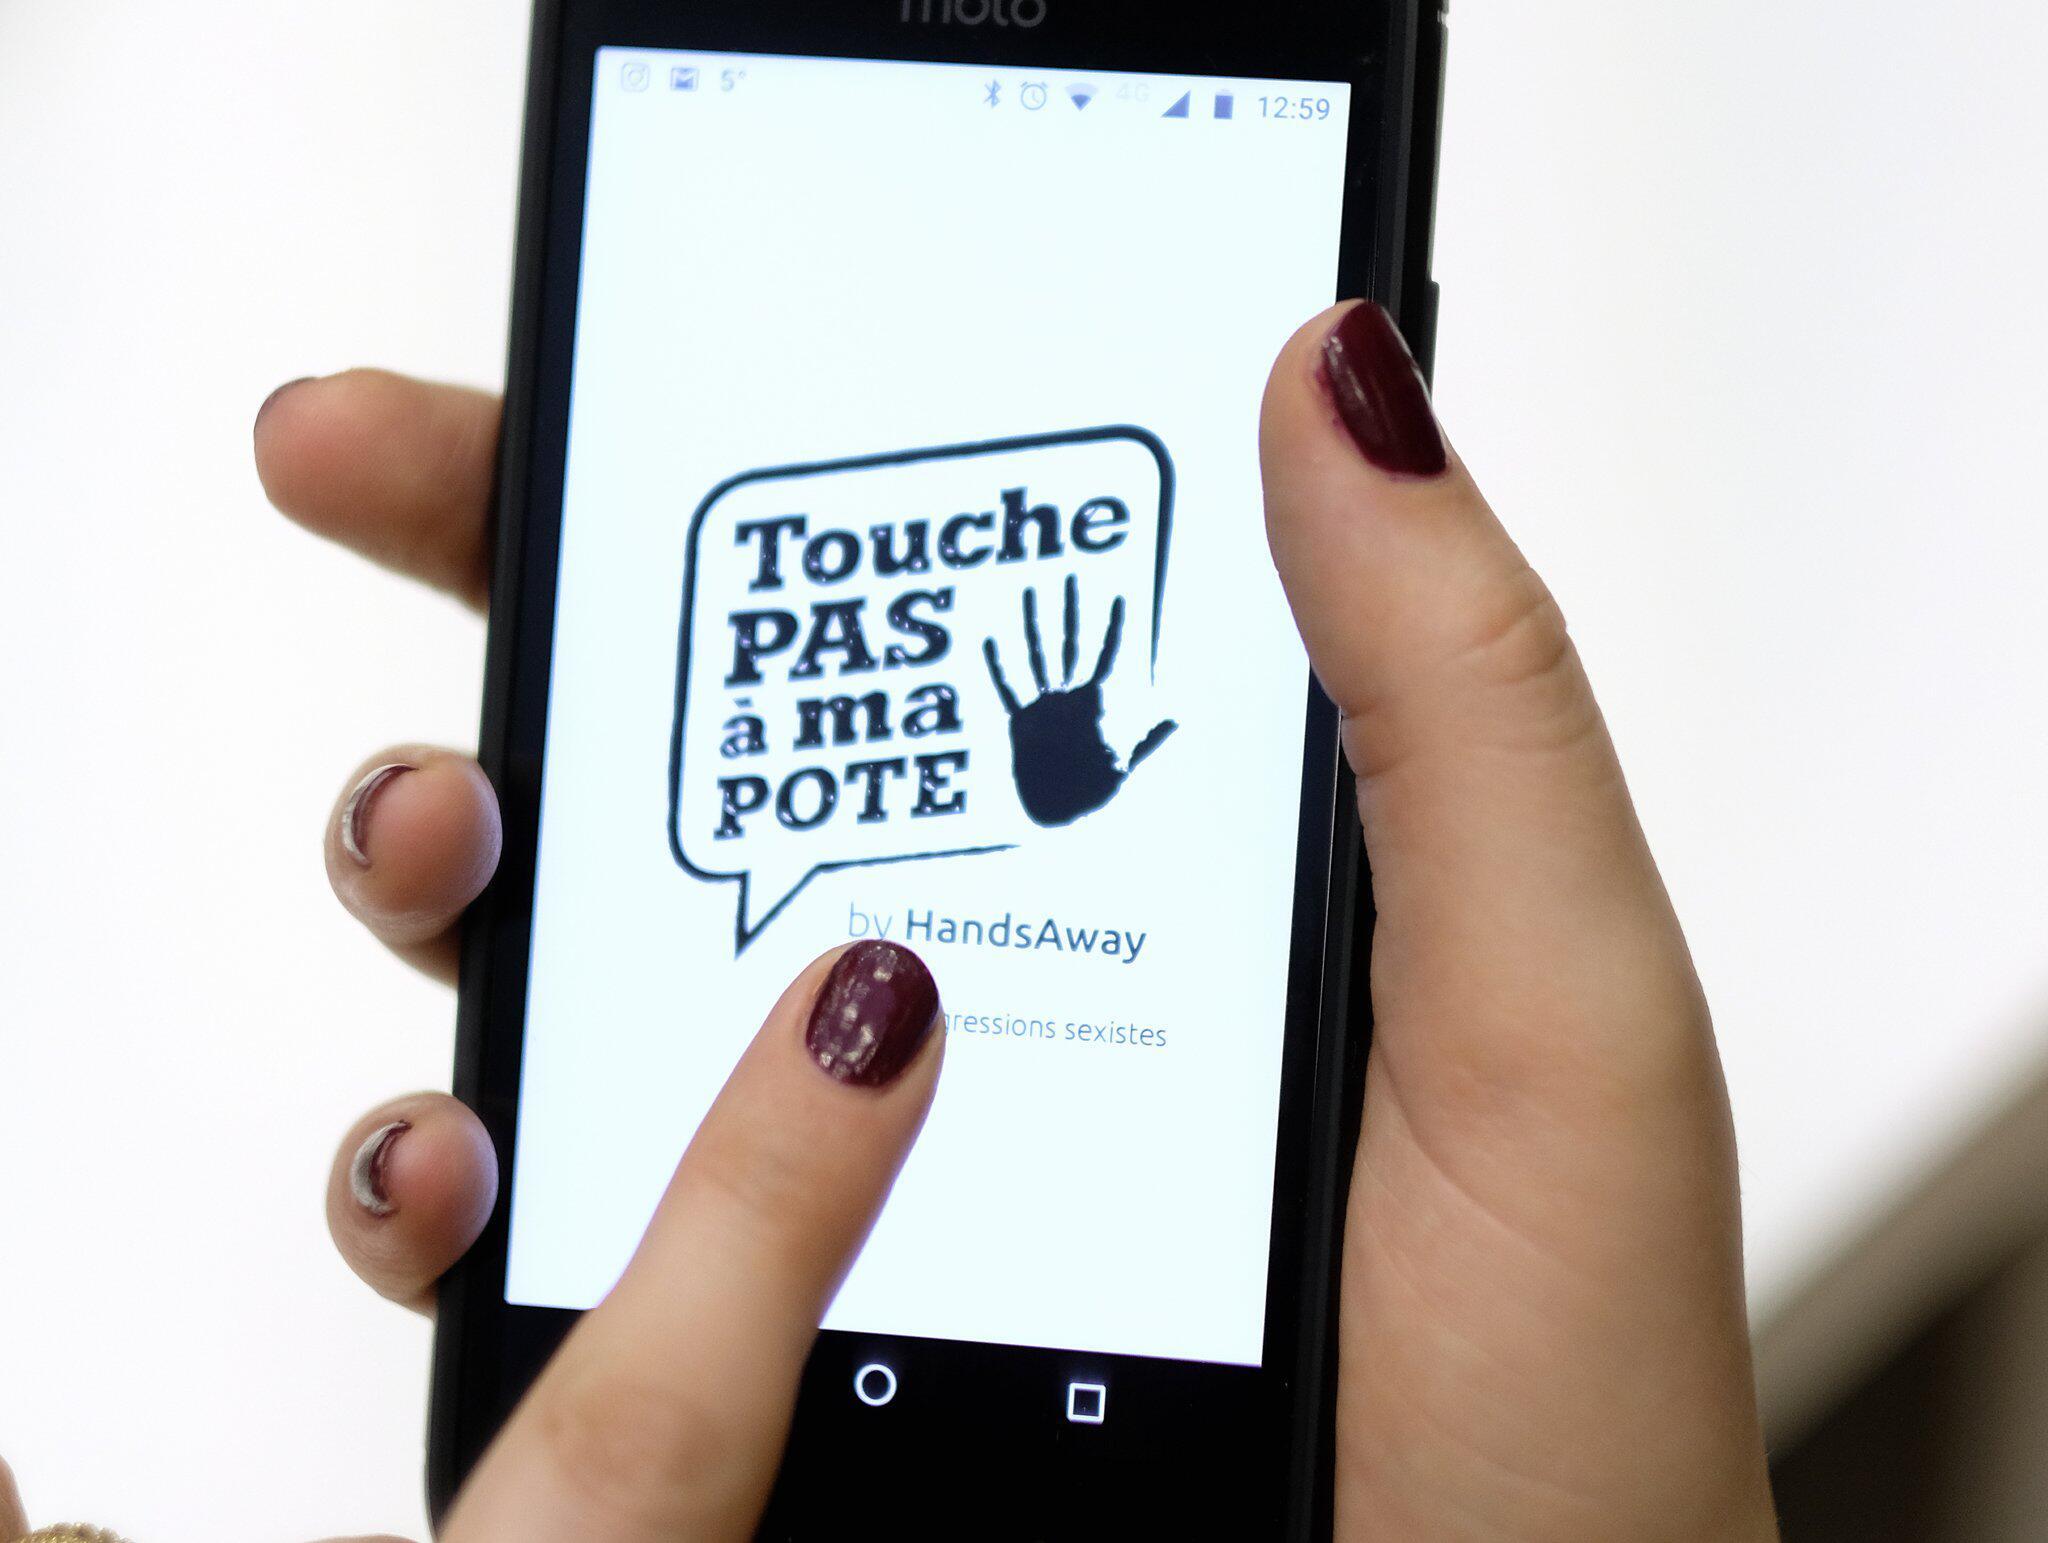 Bild zu Belgische App «Touche pas a ma pote»